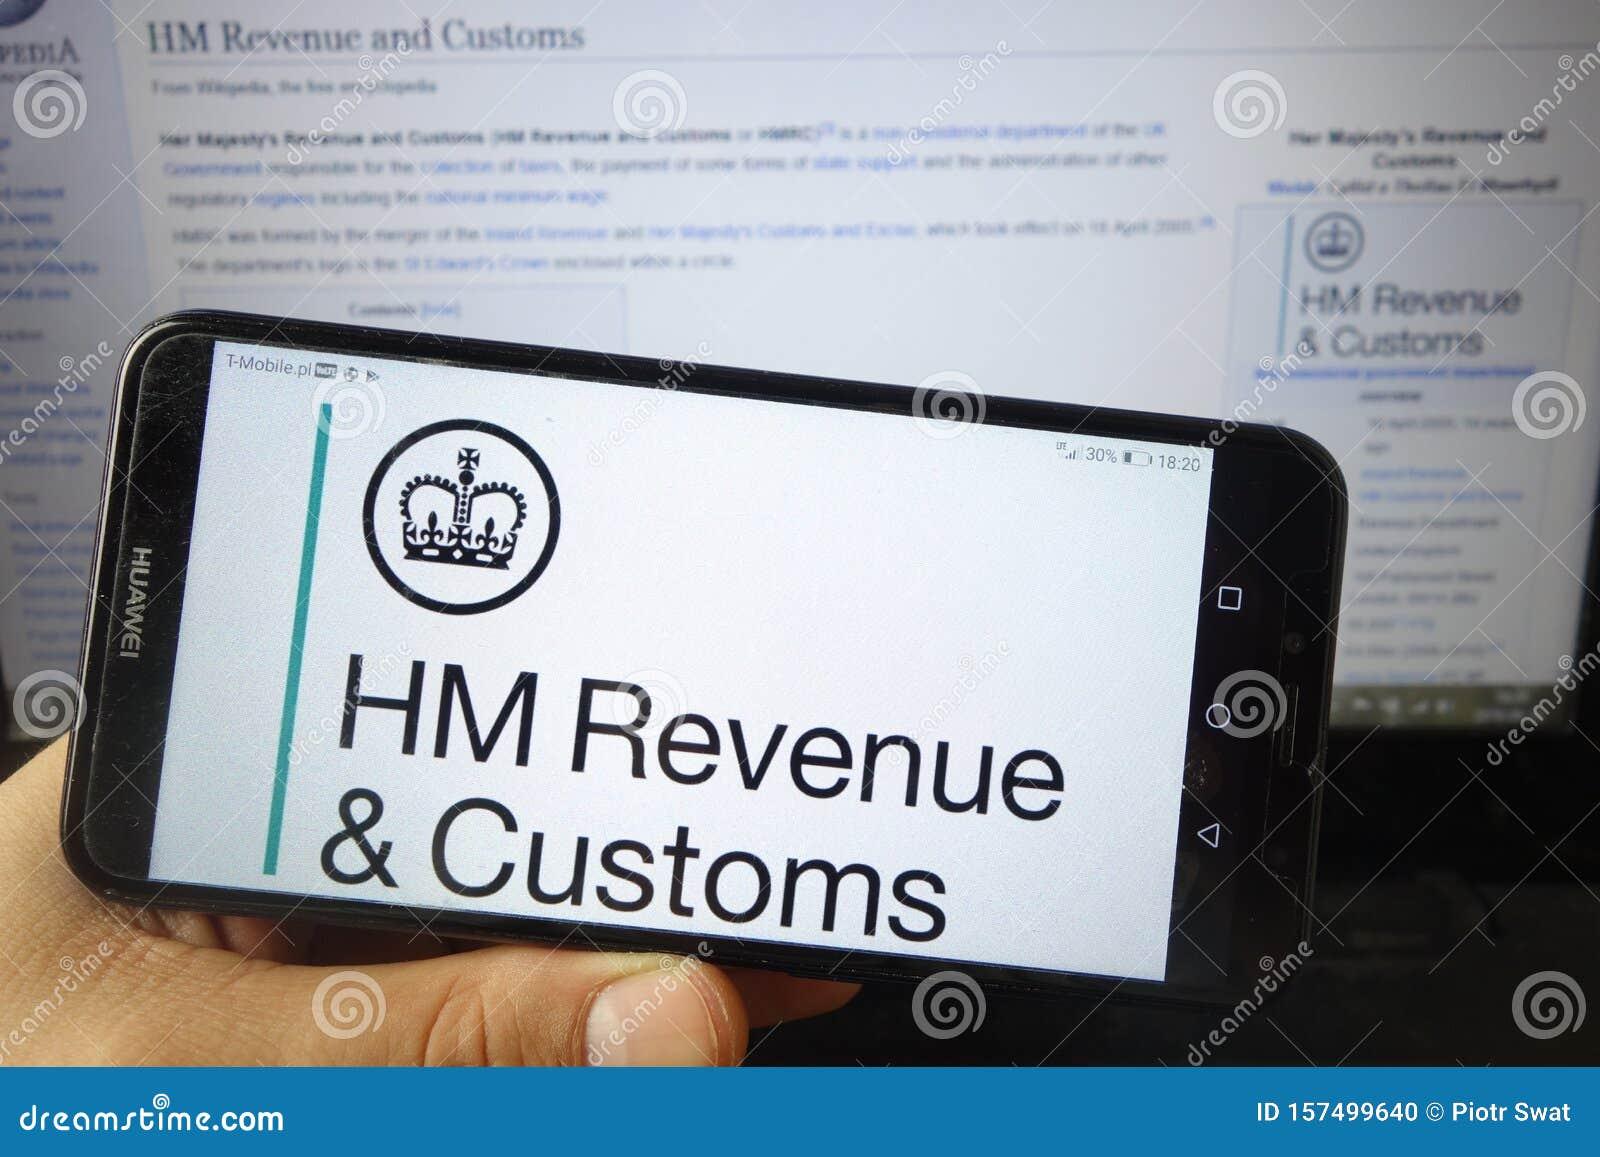 Hm revenue and customs business plan